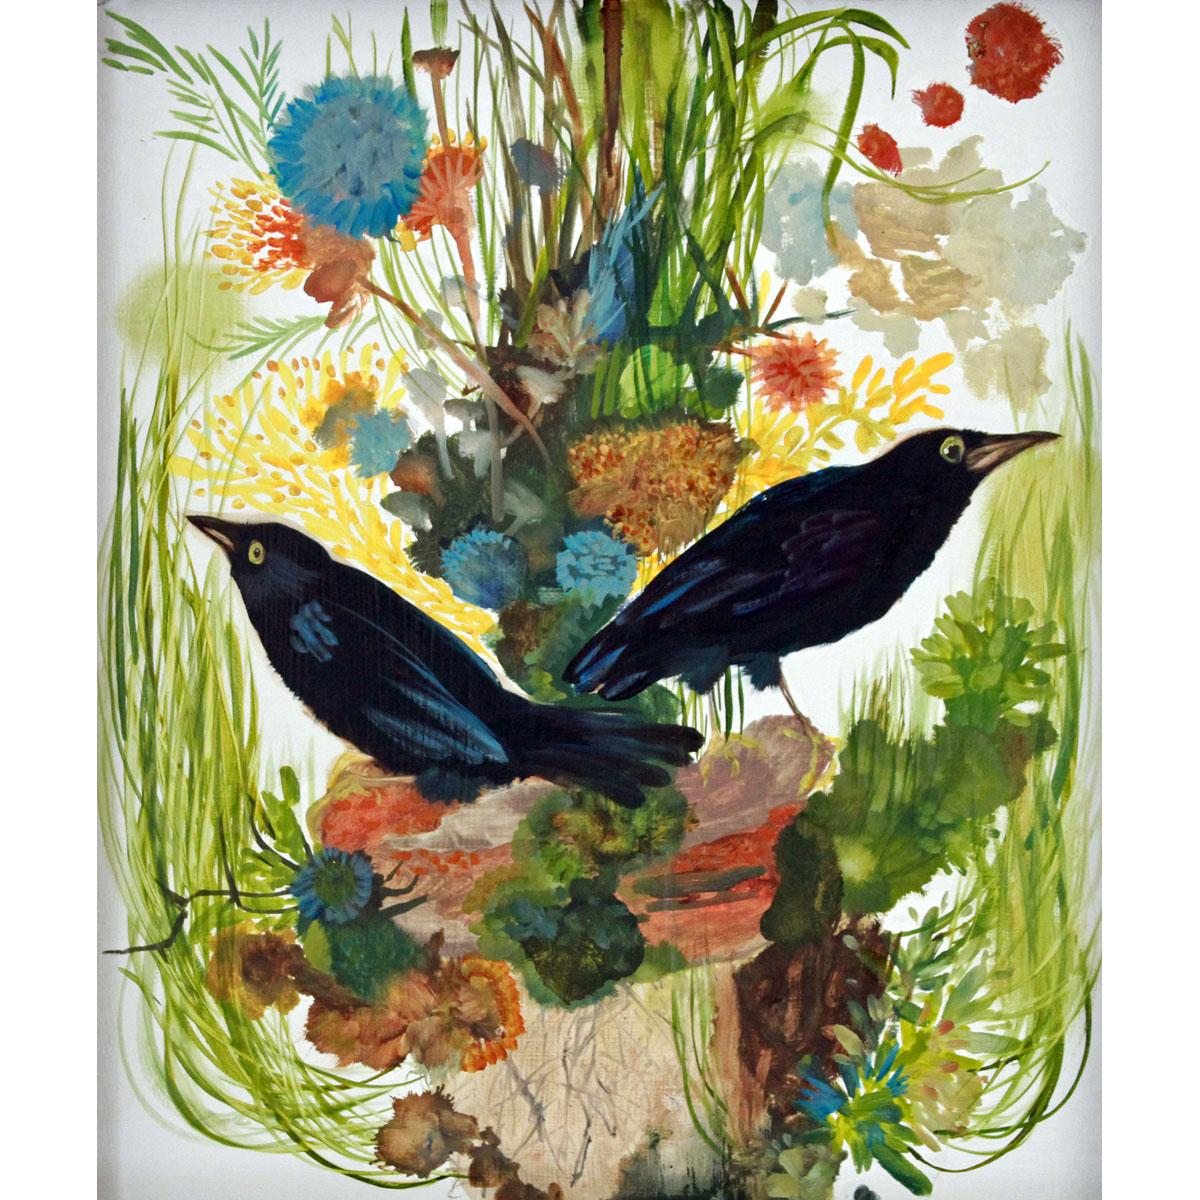 Crow Icon by Diane Kilgore Condon